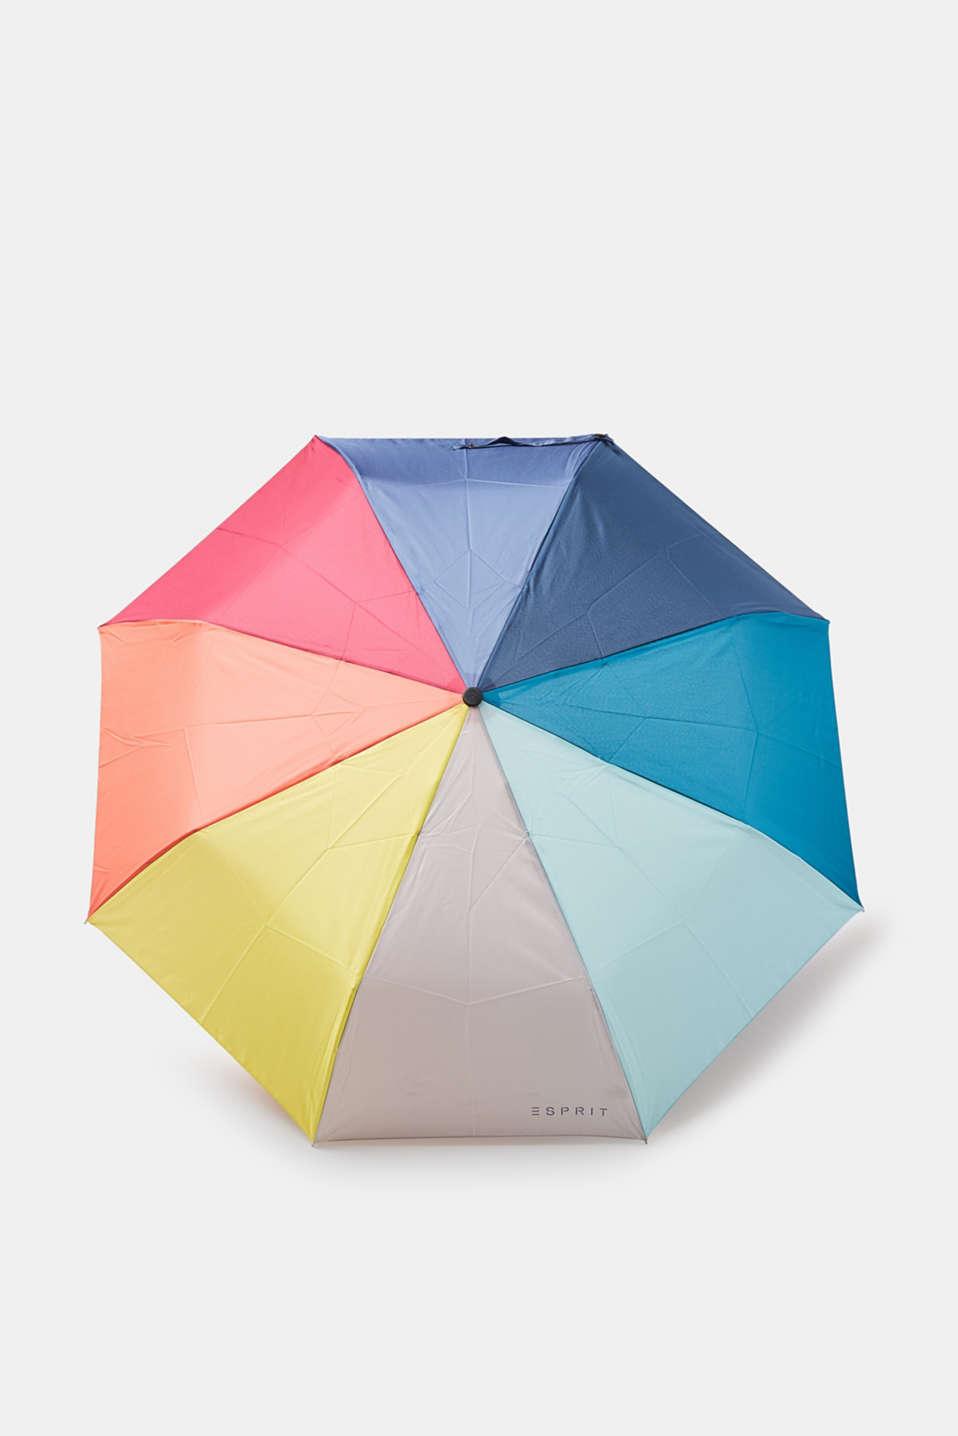 esprit regenschirm in regenbogen farben im online shop kaufen. Black Bedroom Furniture Sets. Home Design Ideas